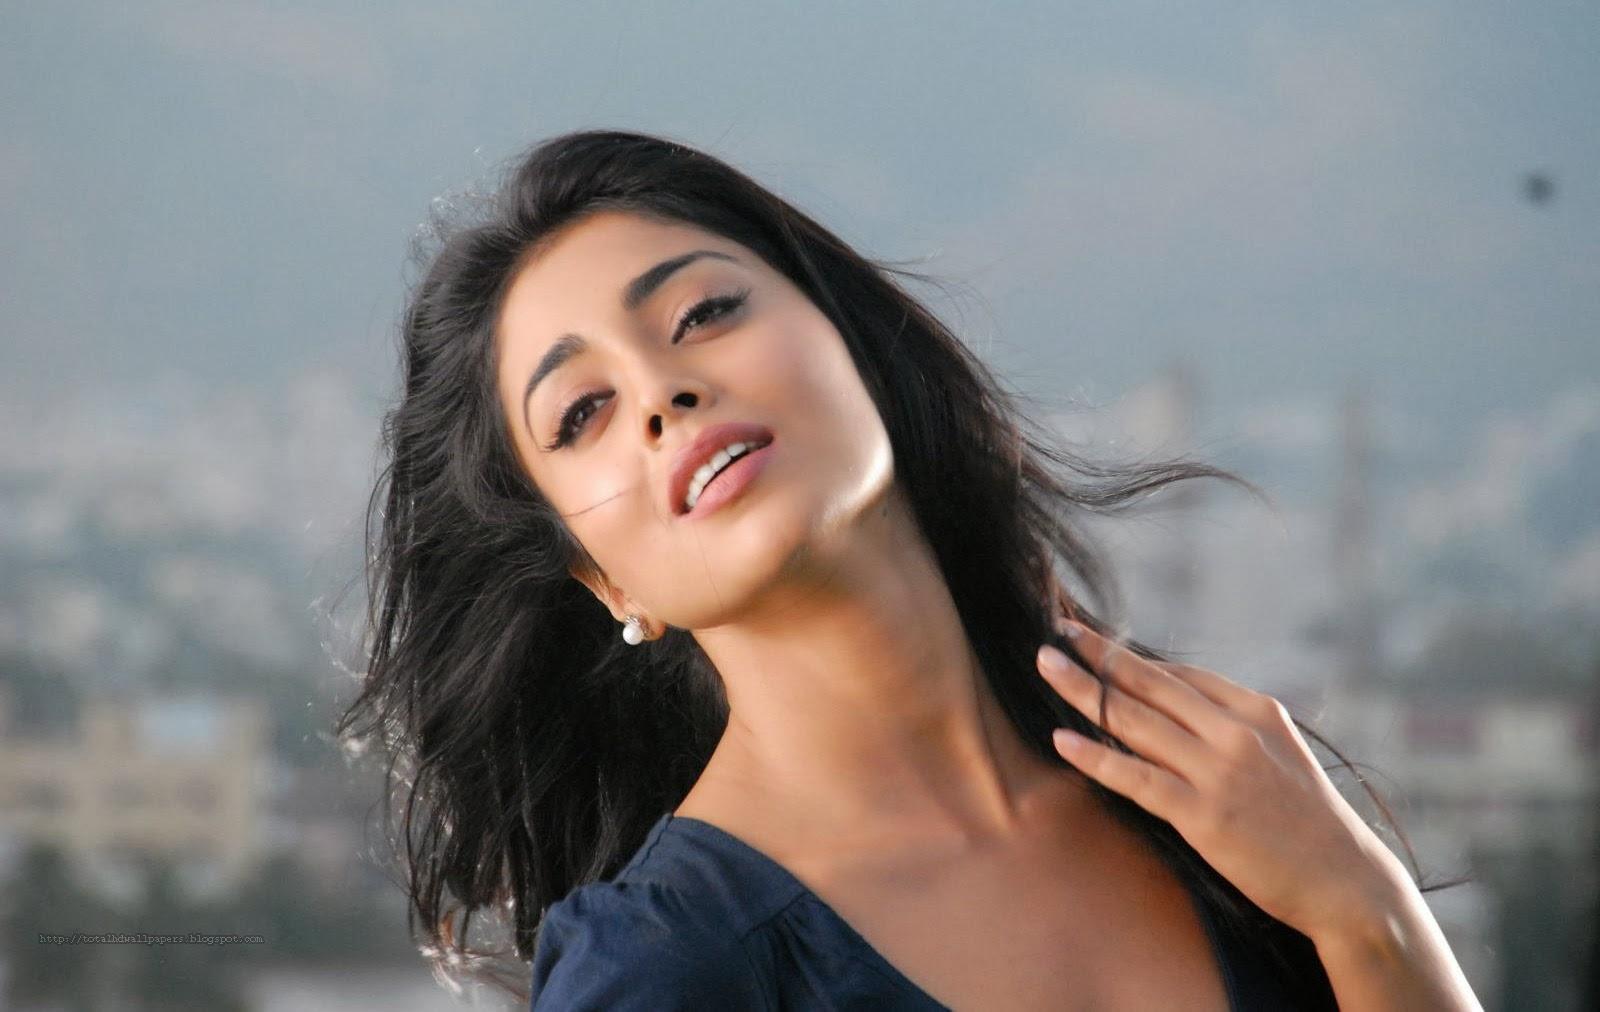 Actress Hd Wallpapers 1080p Wallpapersafari